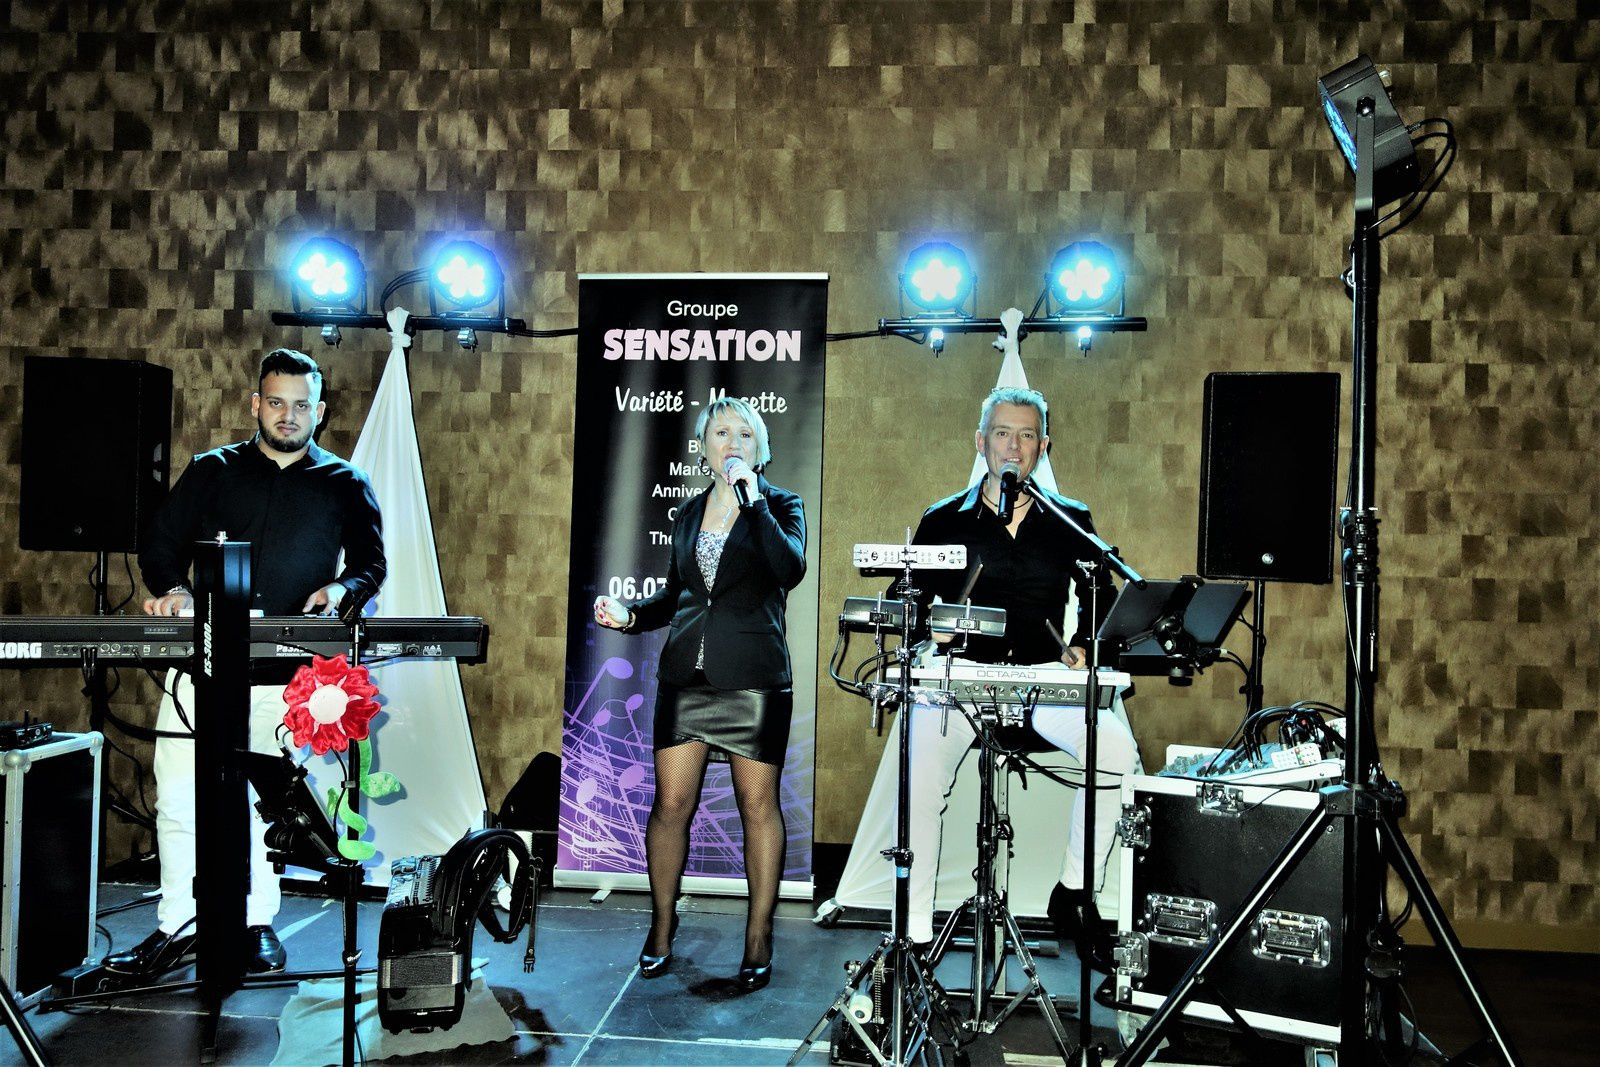 Groupe chanteur anniversaire Gard 30